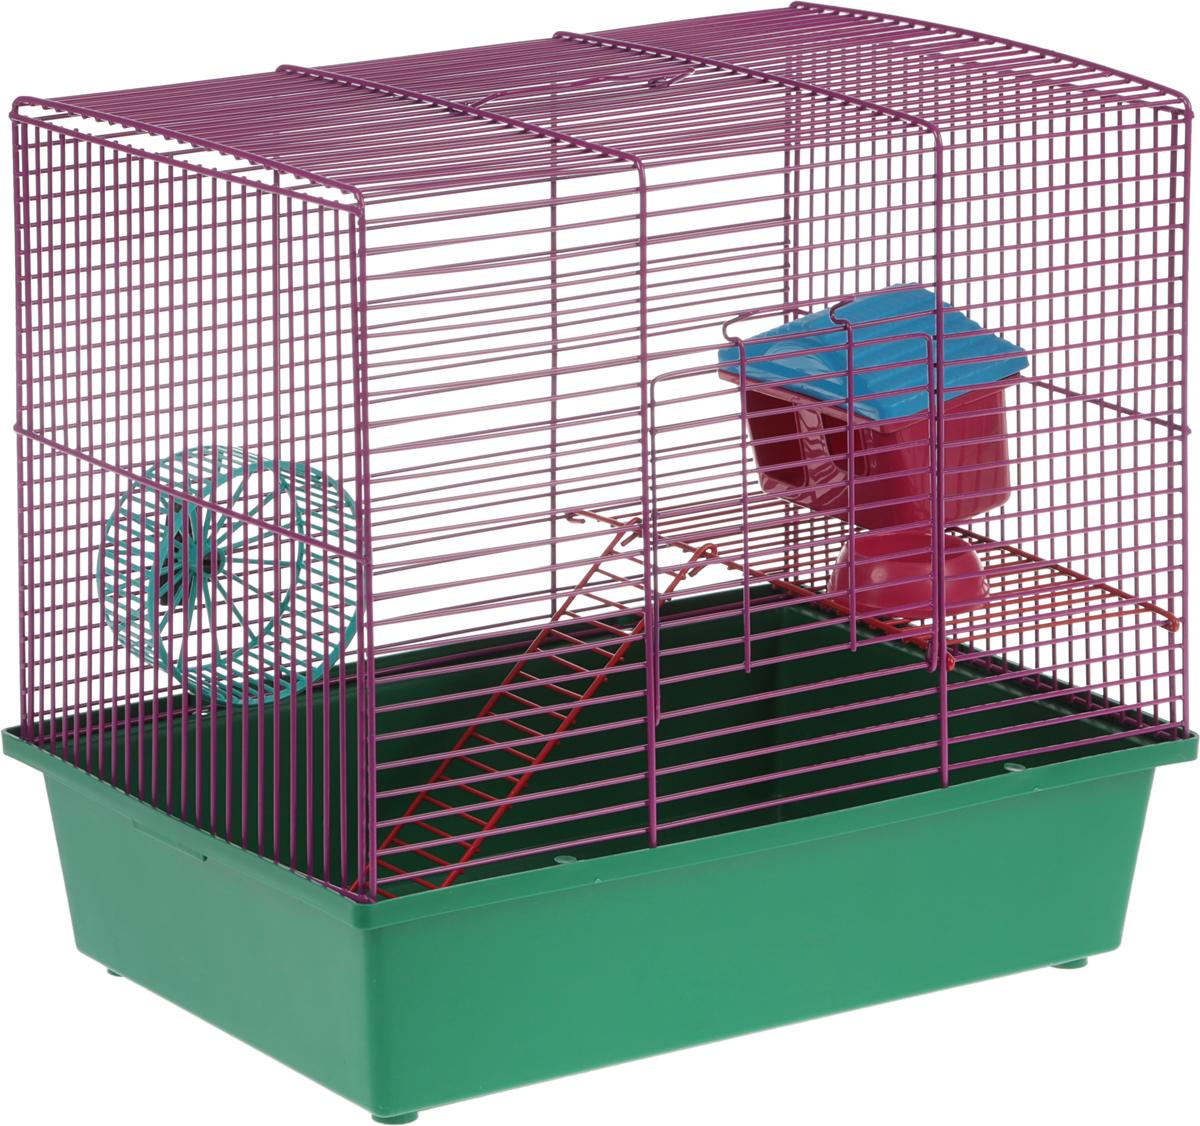 Клетка для грызунов Велес Lusy Hamster-2, 2-этажная, цвет: фиолетовый, зеленый, 35 х 26 х 26 см клетка для грызунов inter zoo teddy gigant 2 комплект для крыс 59х36х56см o c